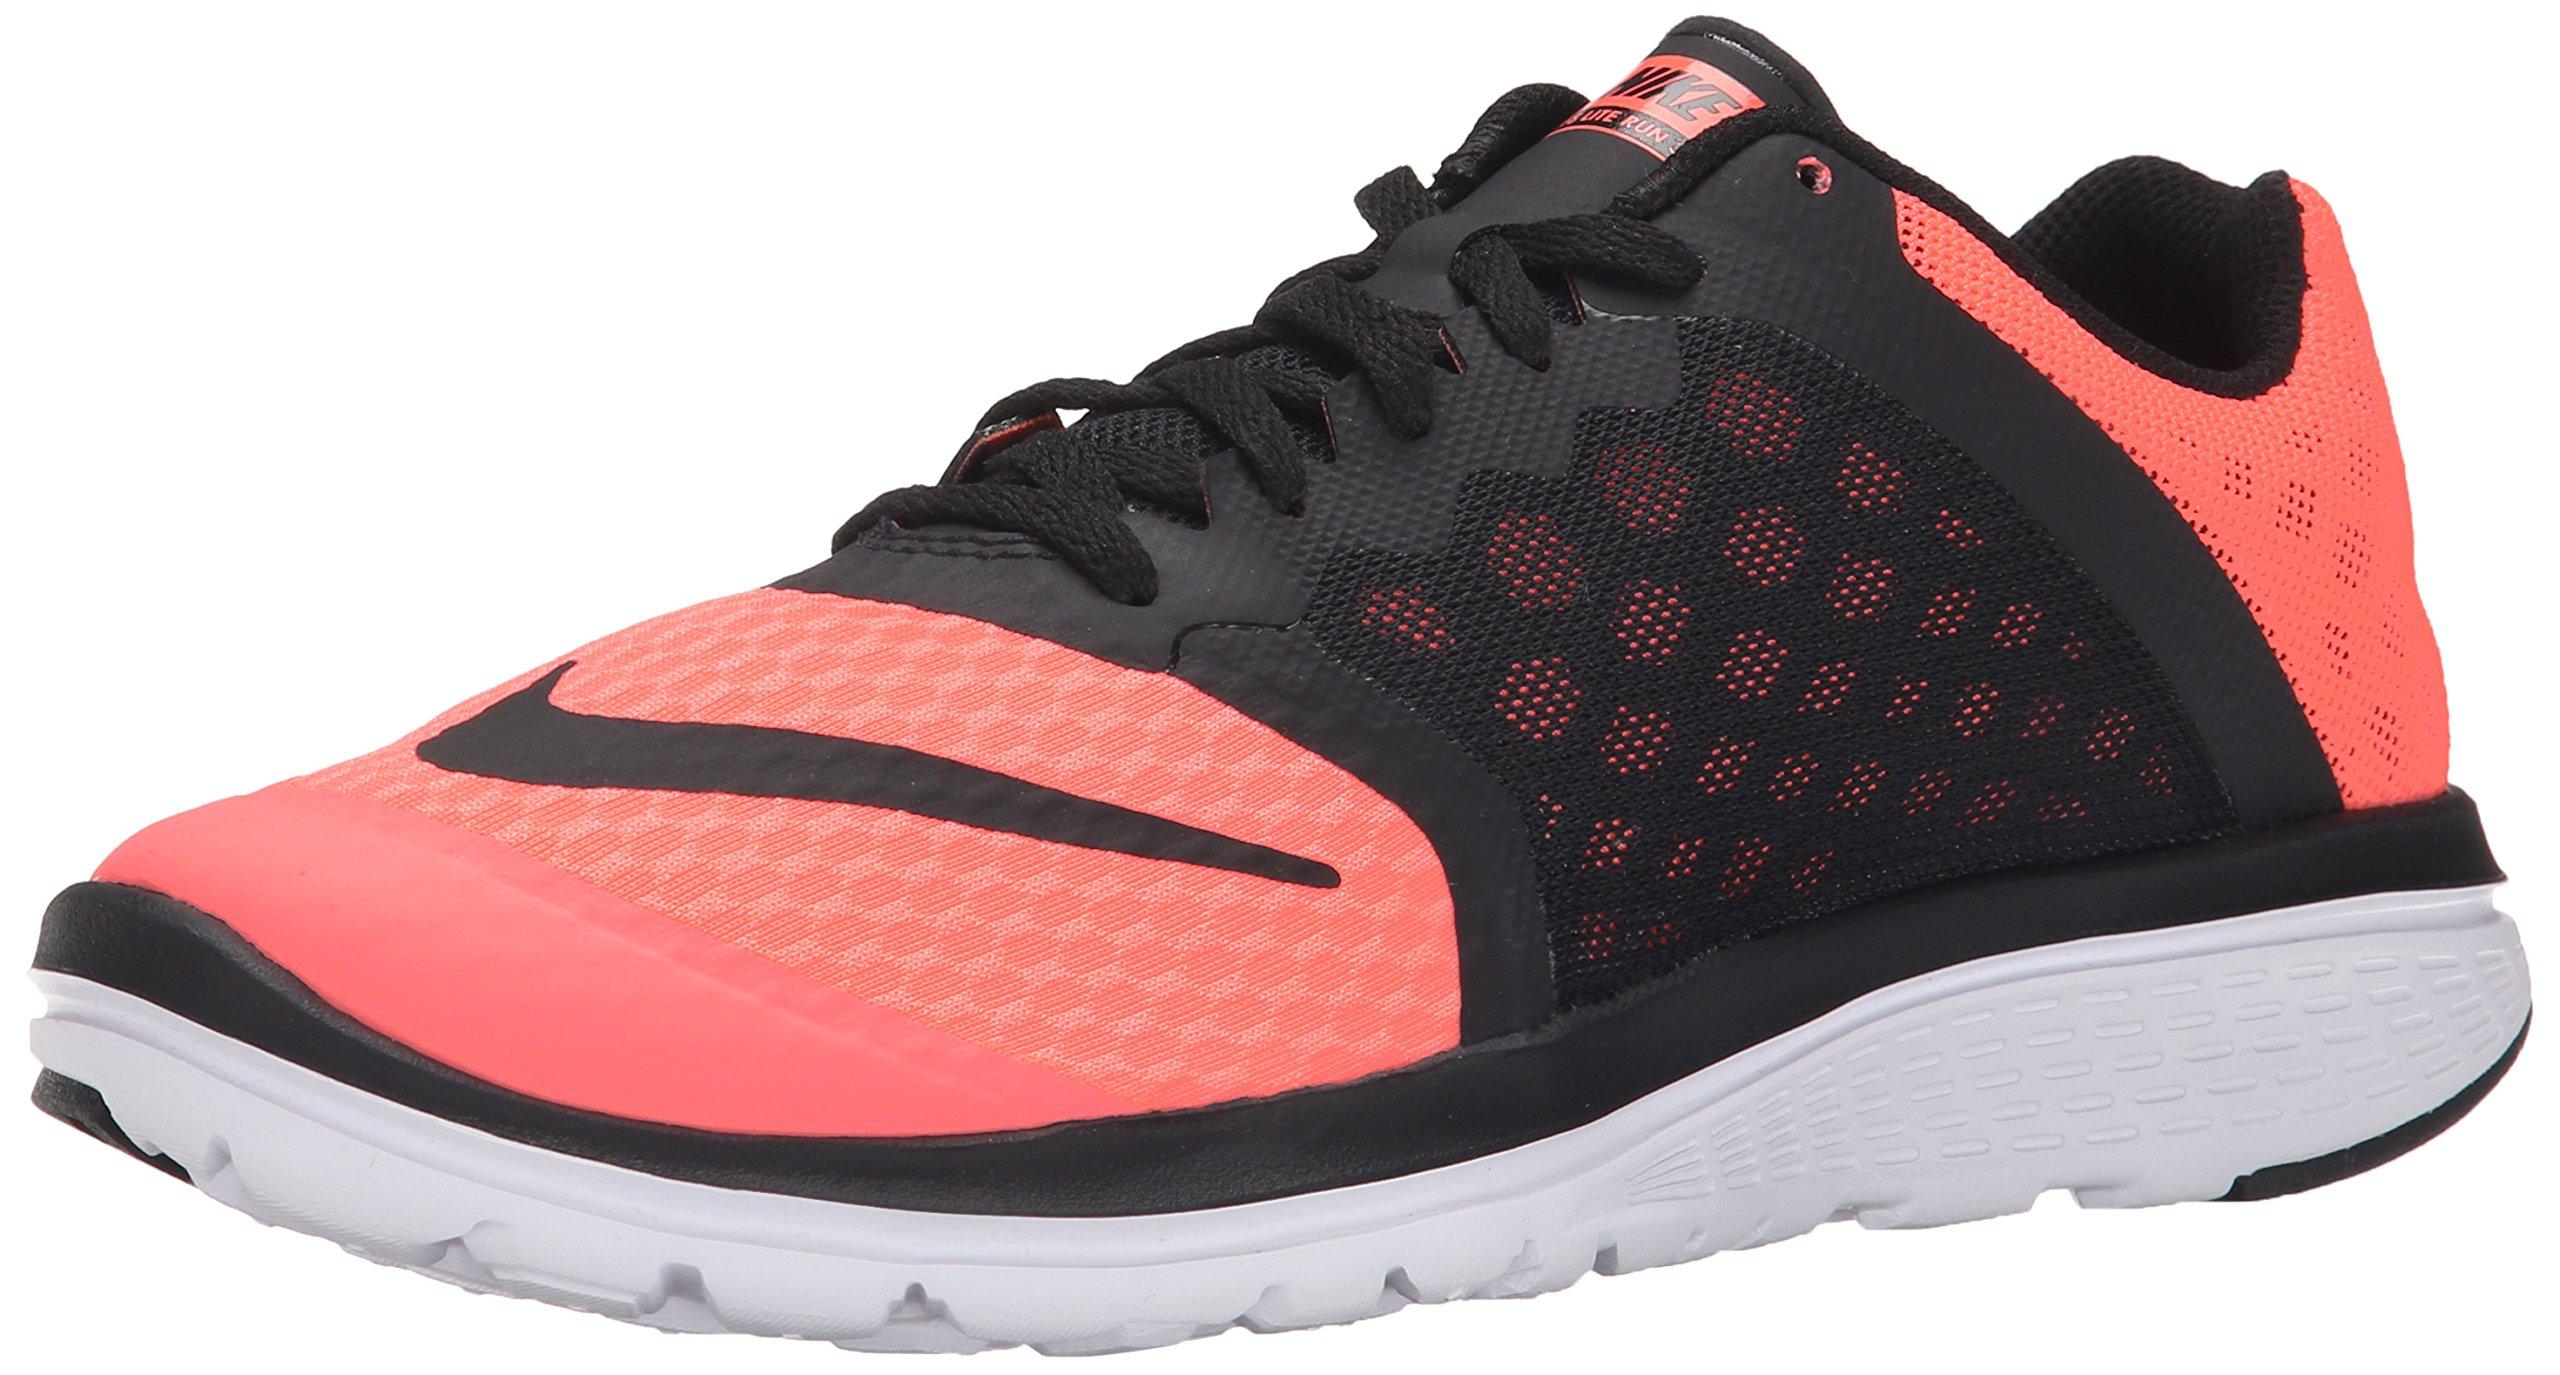 2caed6e435a17 Galleon - Nike Women s Fs Lite Run 3 Lava Glow Black White Running Shoe 6.5  Women US